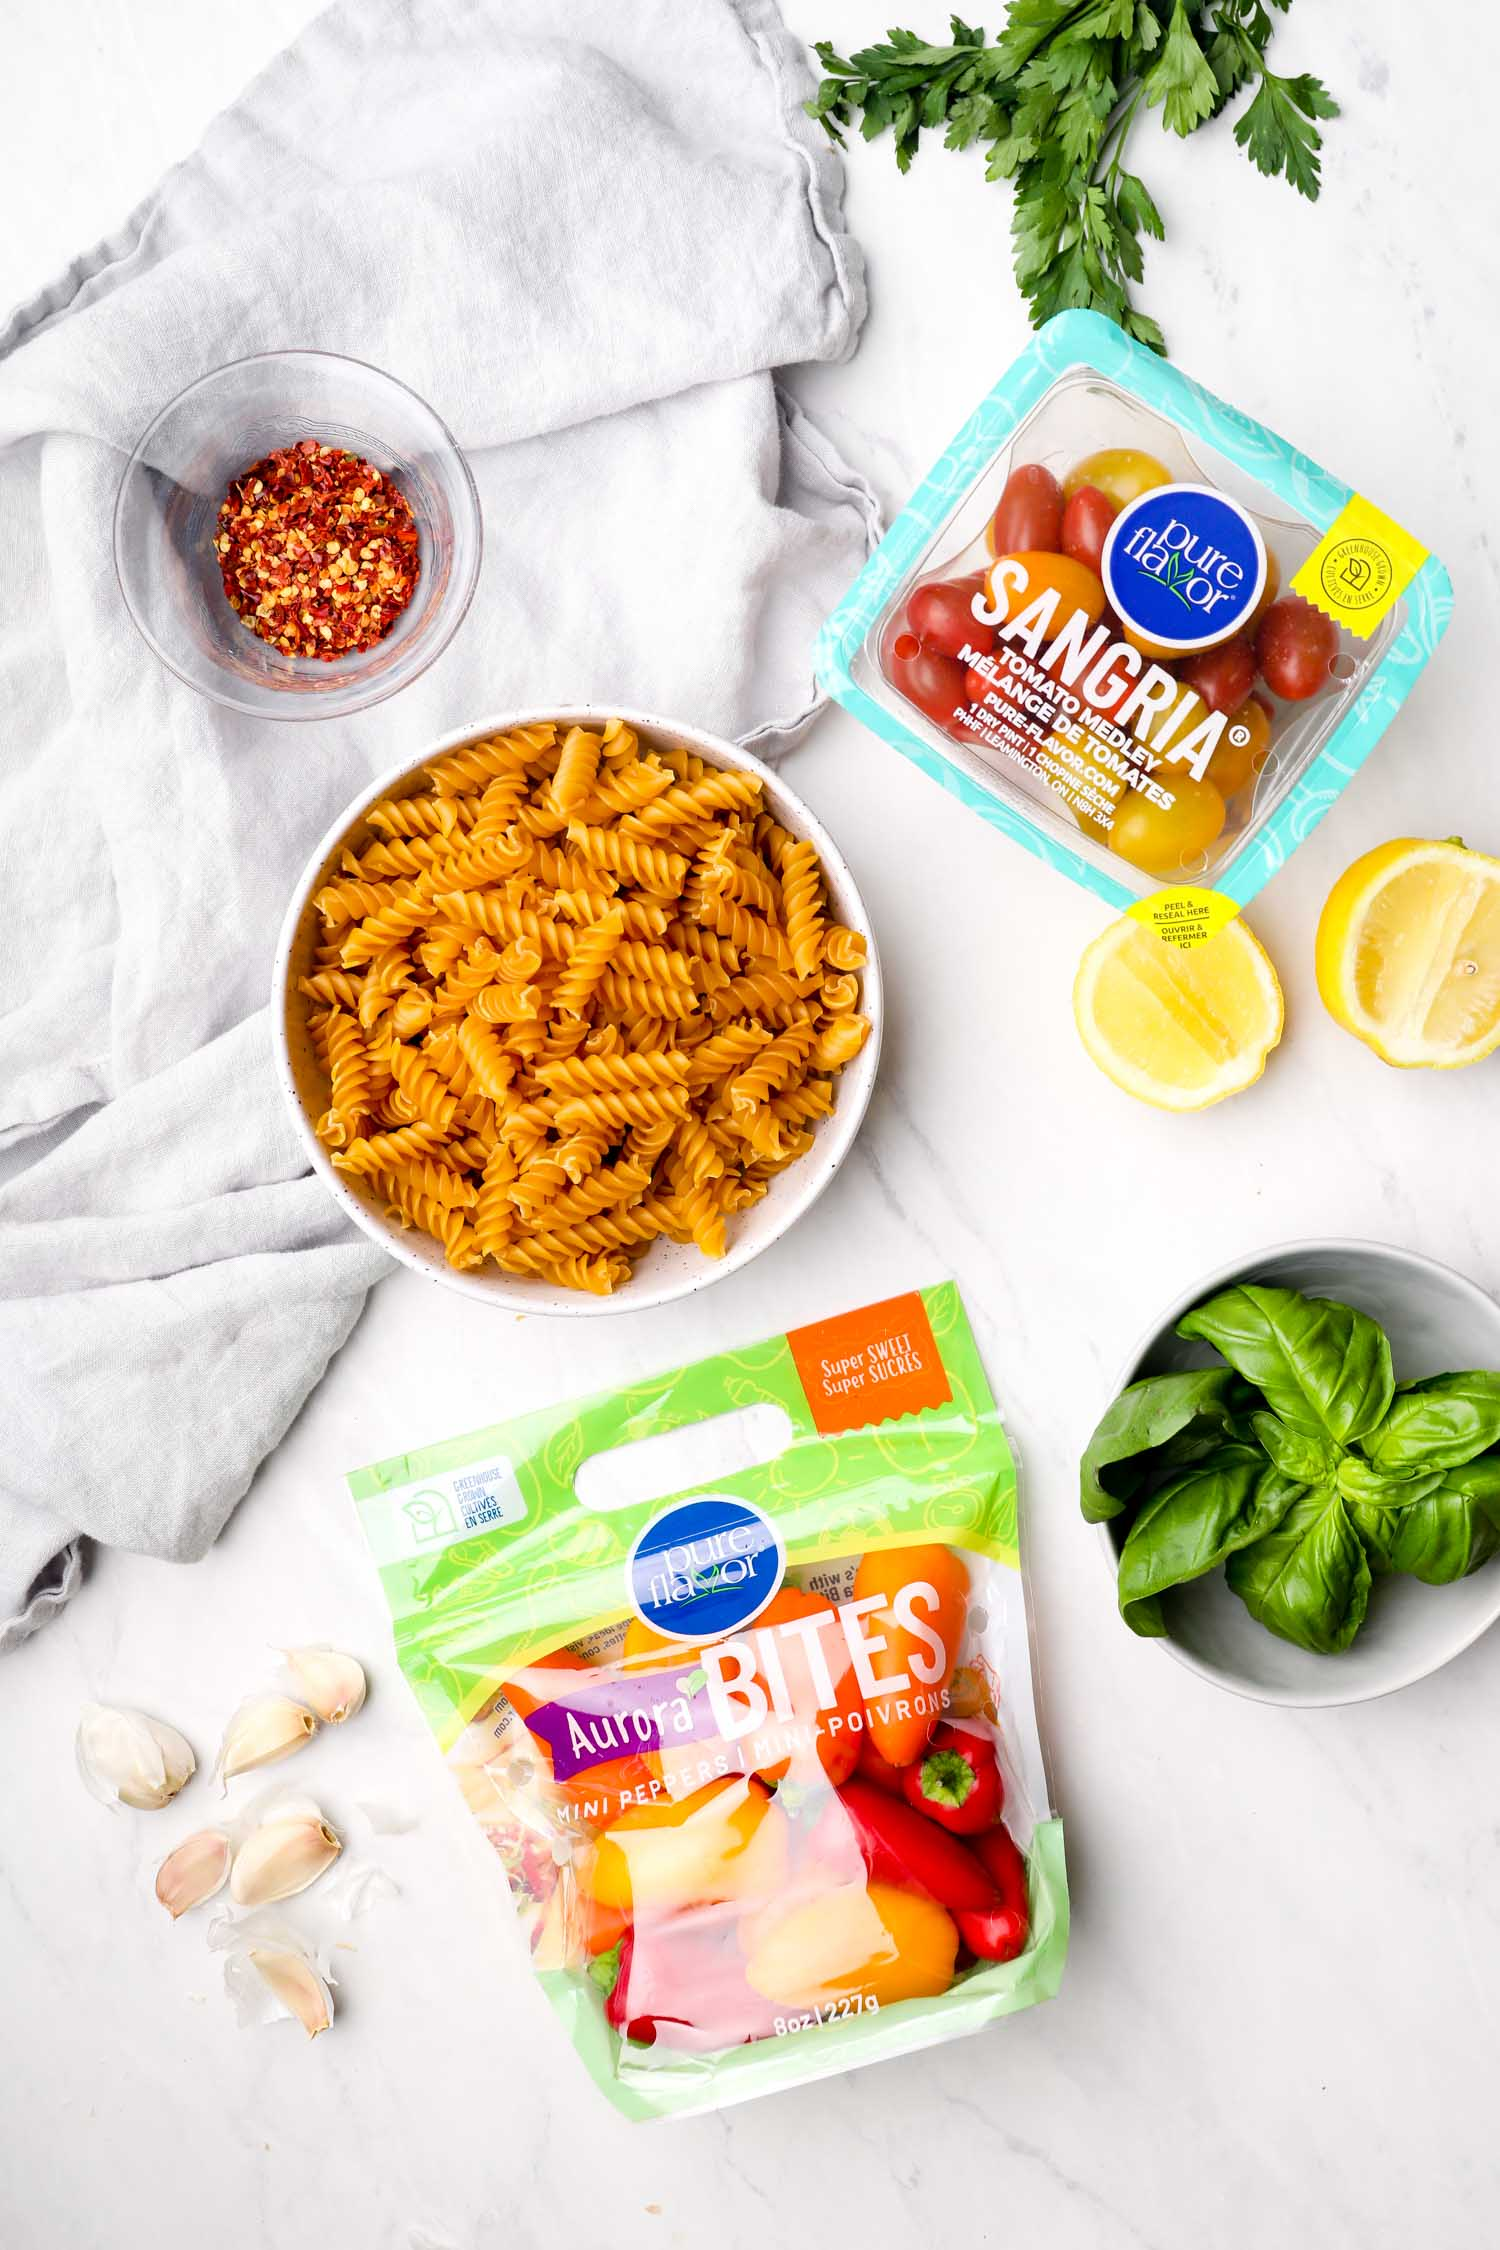 The ingredients needed for Vegan Pasta Primavera